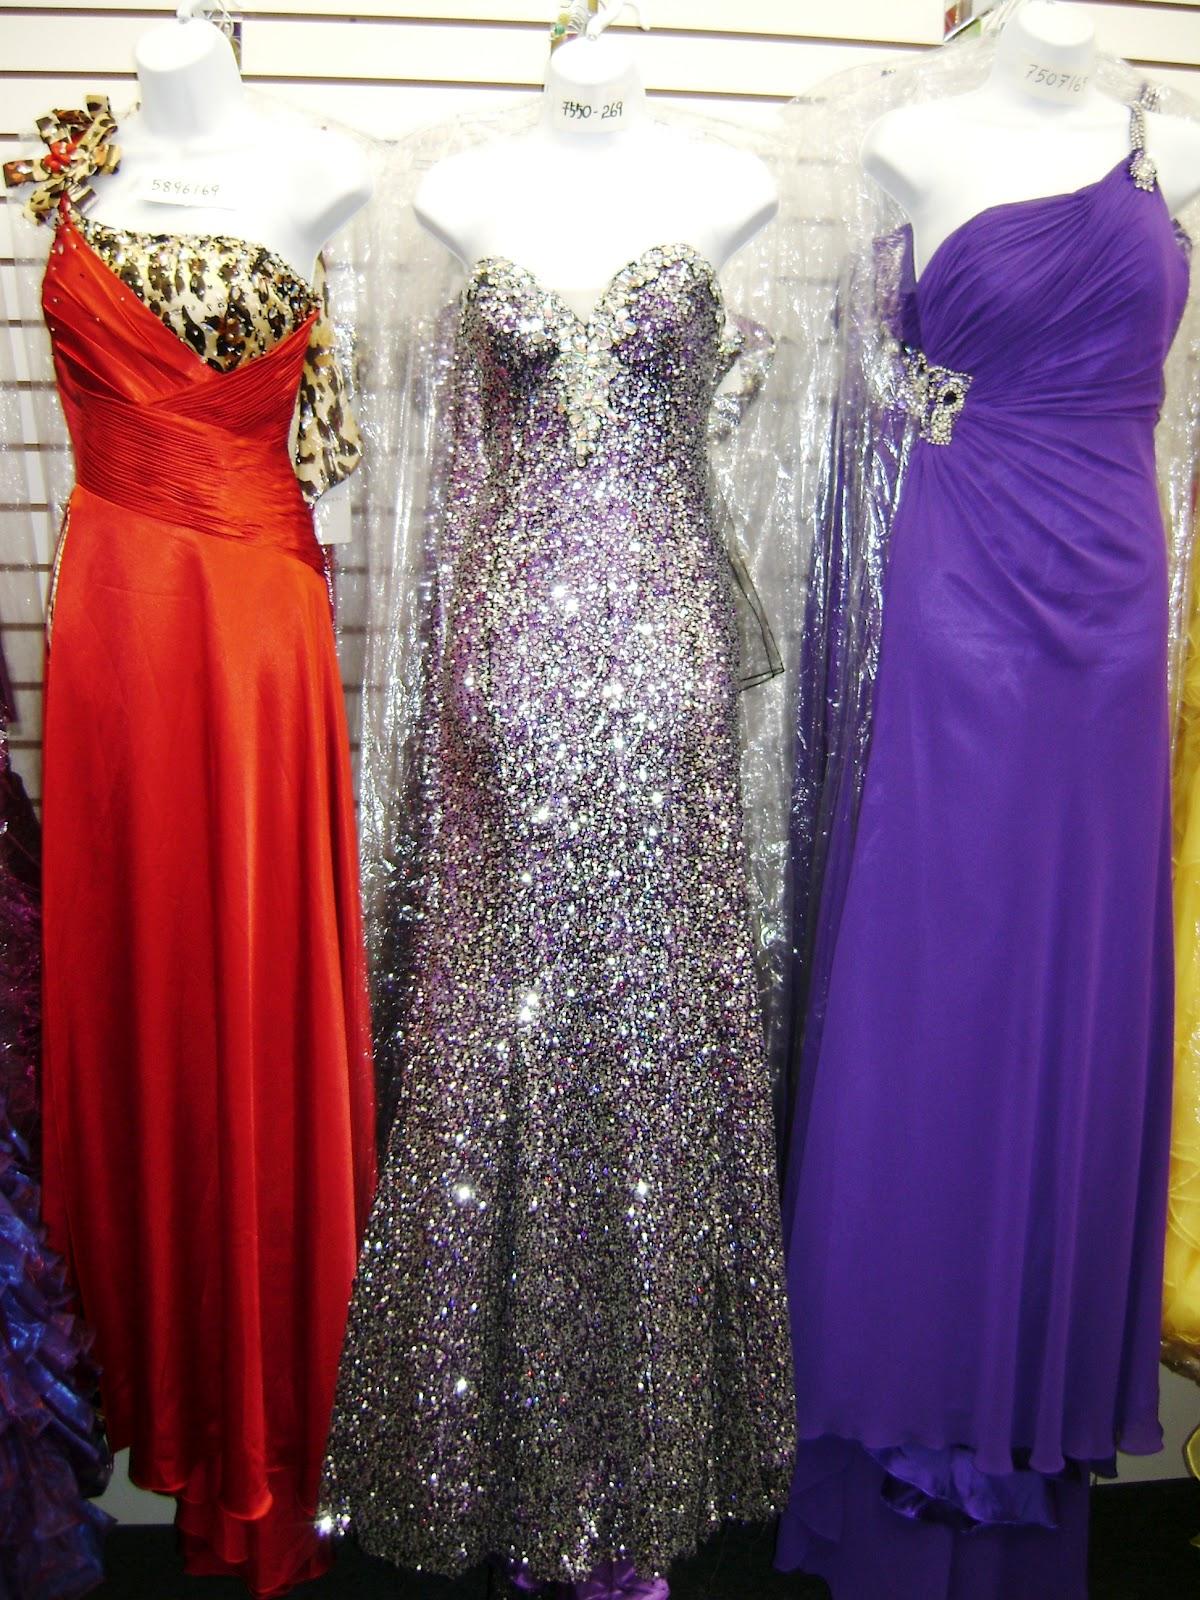 b51713af1b1 Prom Dresses In Downtown La Fashion District - Data Dynamic AG